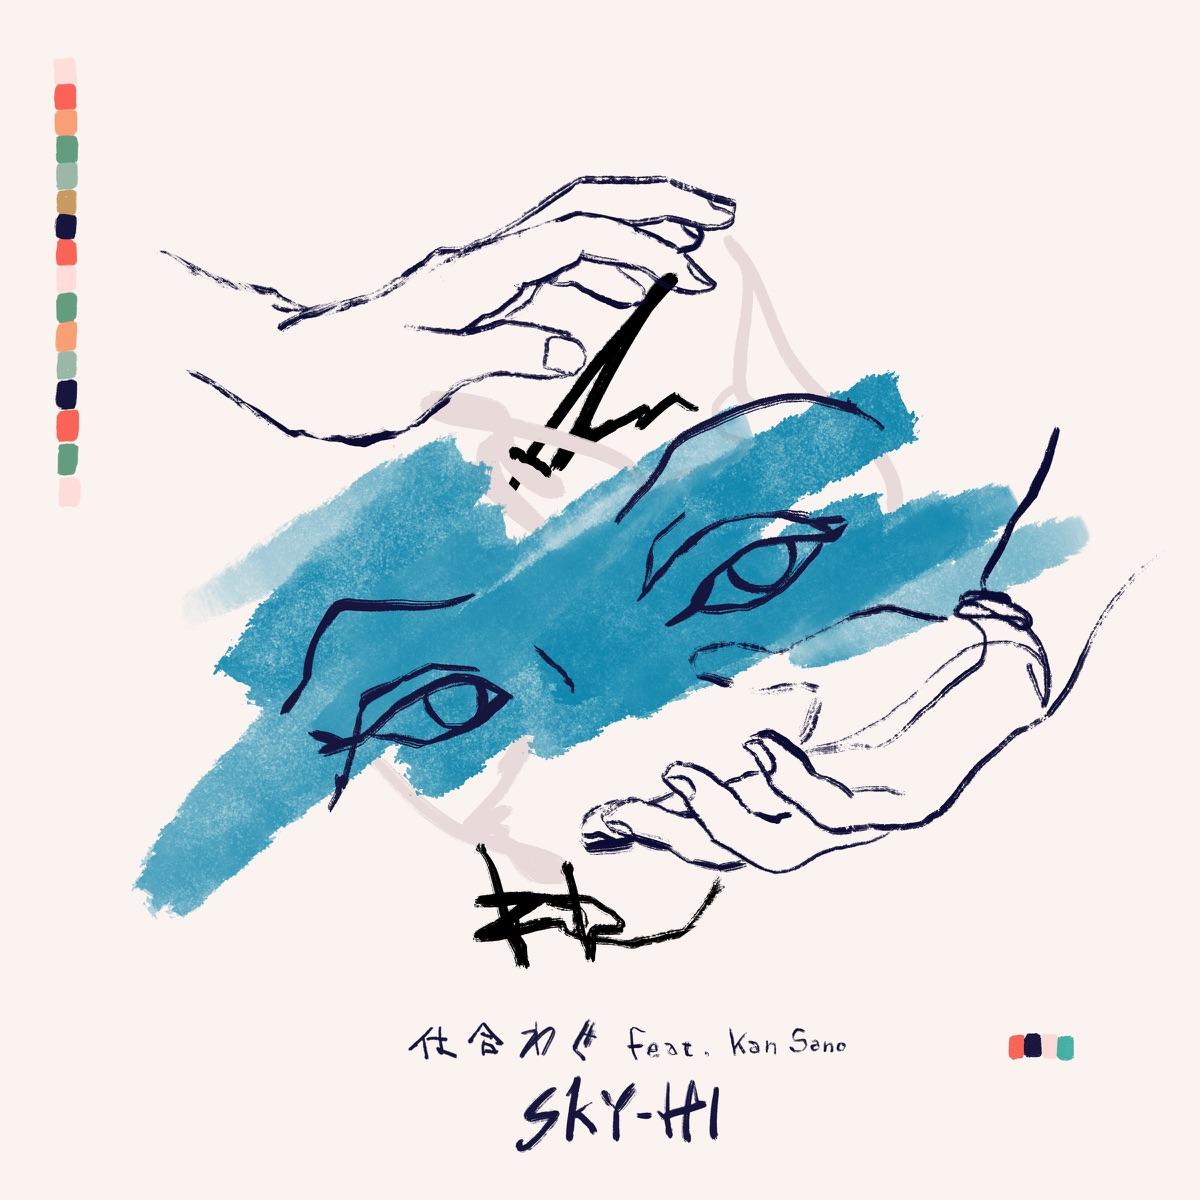 『SKY-HI - 仕合わせ feat. Kan Sano』収録の『仕合わせ feat. Kan Sano』ジャケット